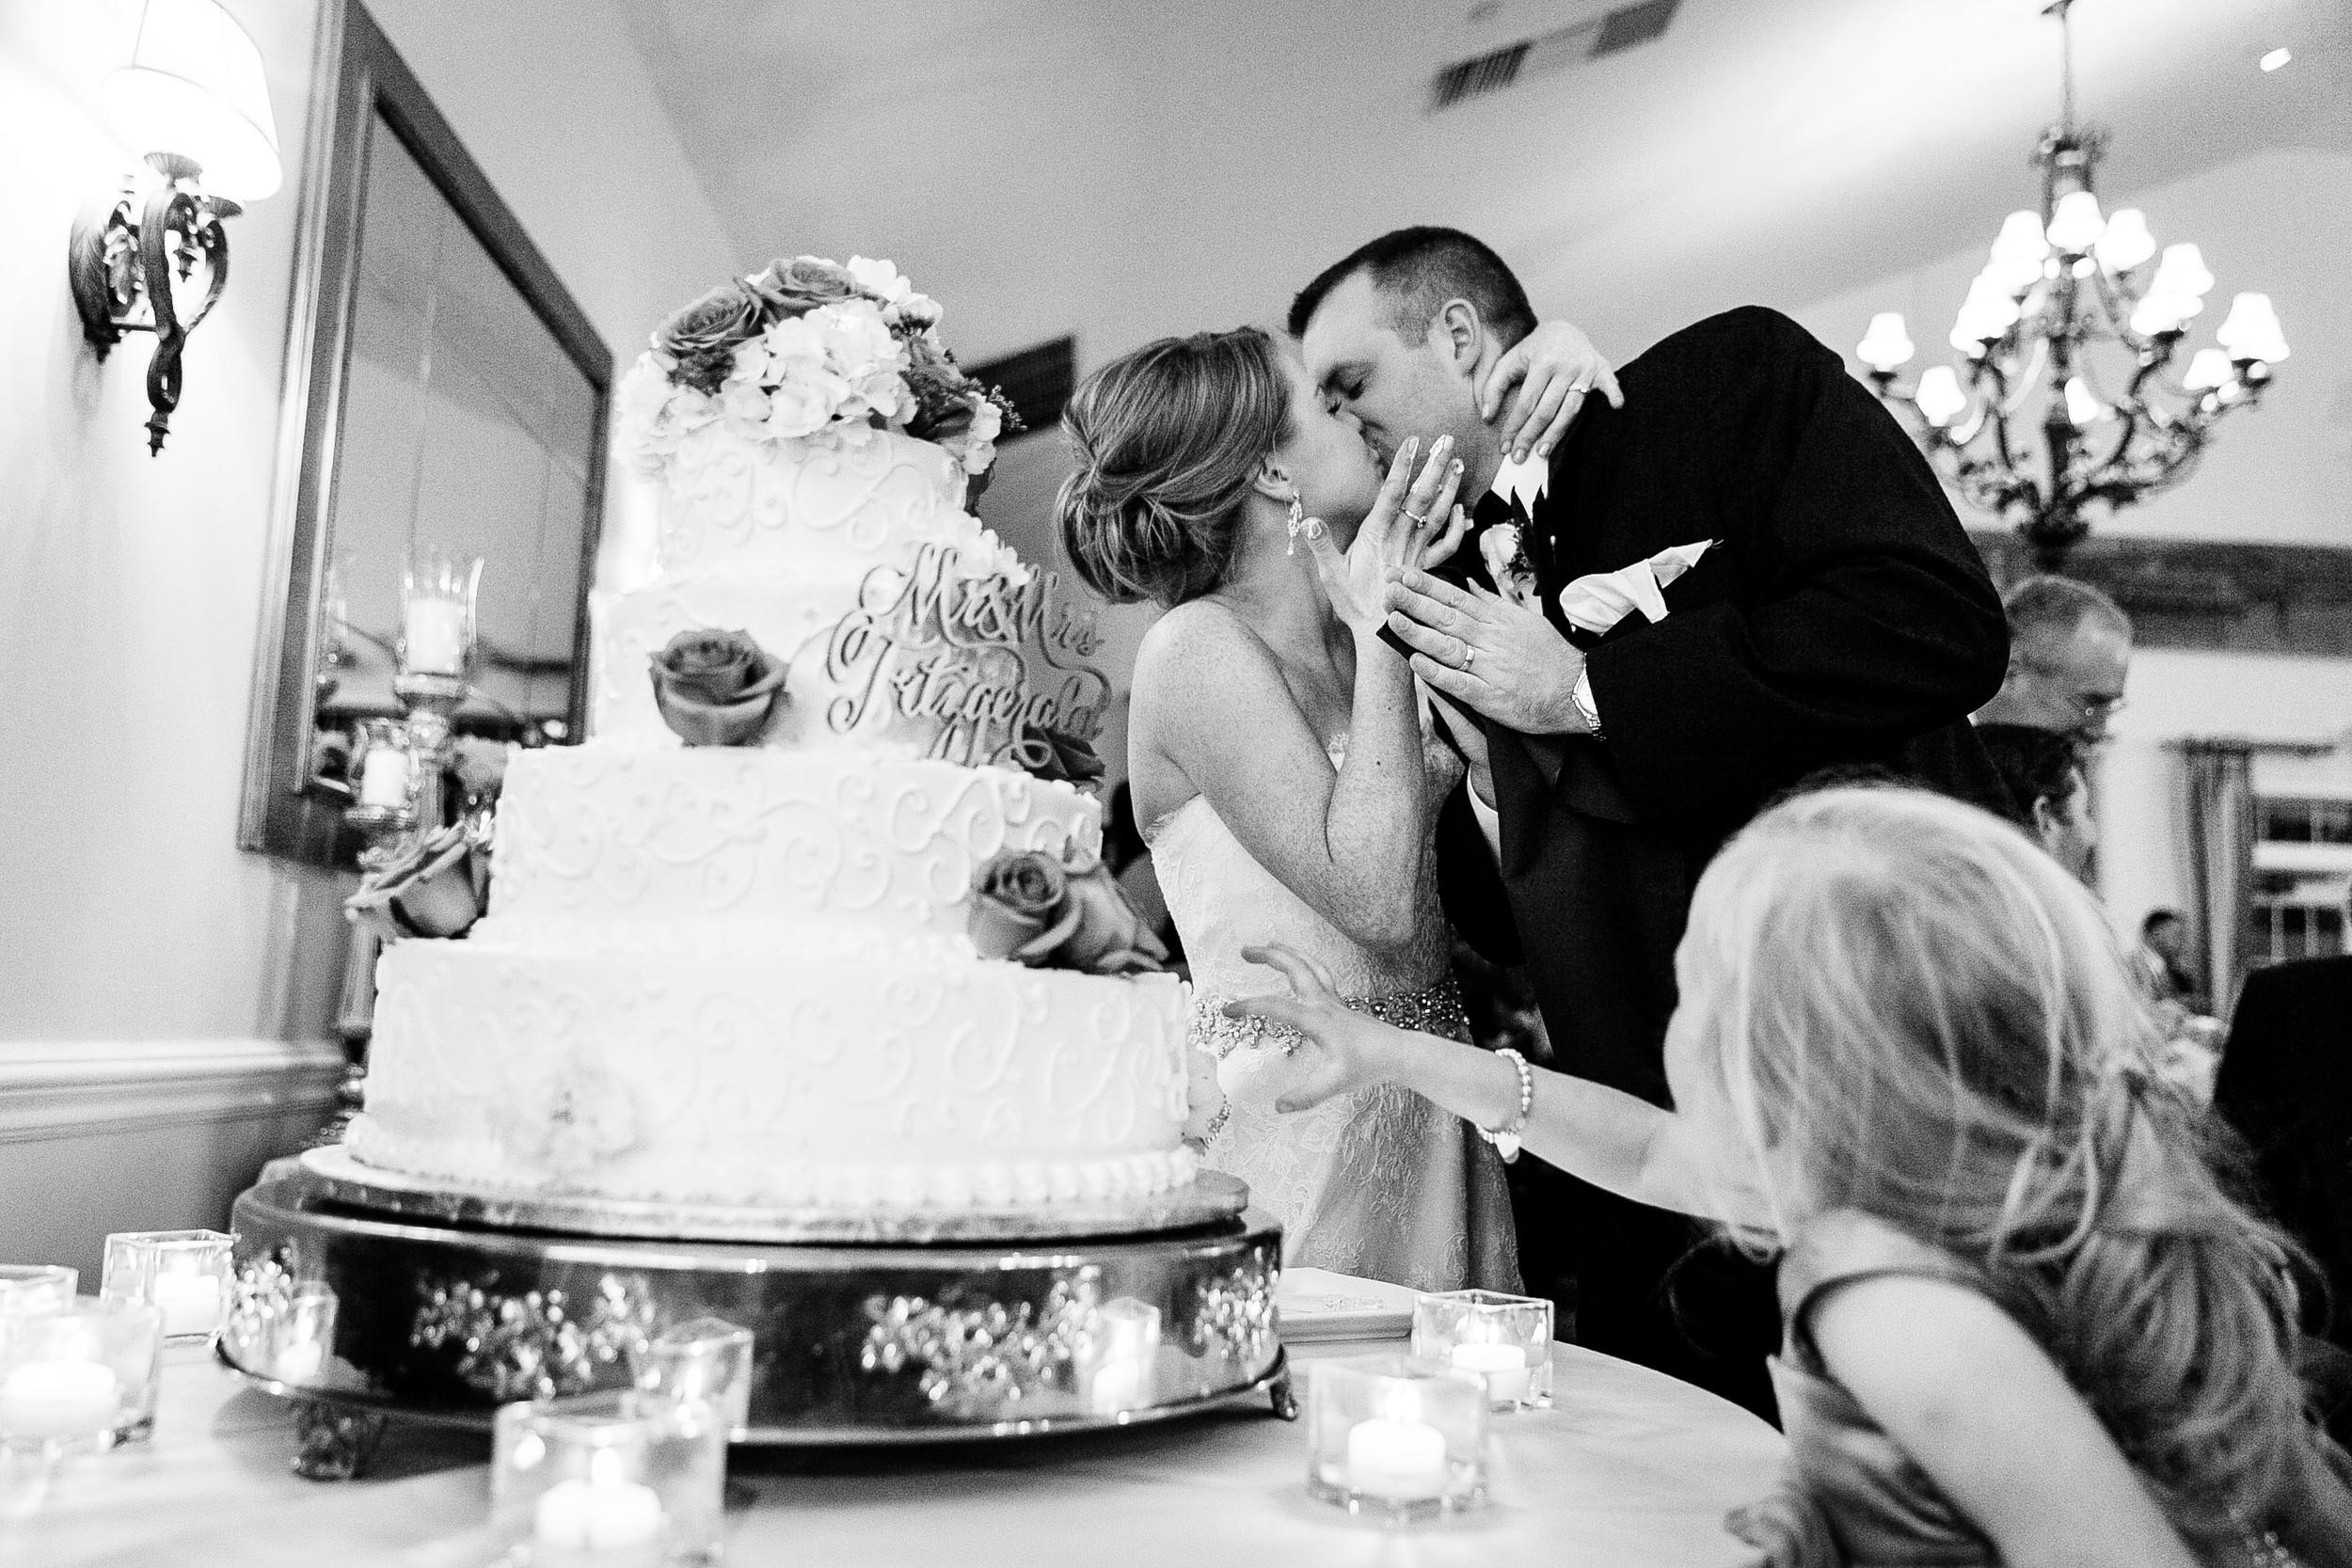 American-Wedding-The-Riverhouse-at-Goodspeed-Station-Haddam-CT-Jacek-Dolata-Photography.jpg.jpg